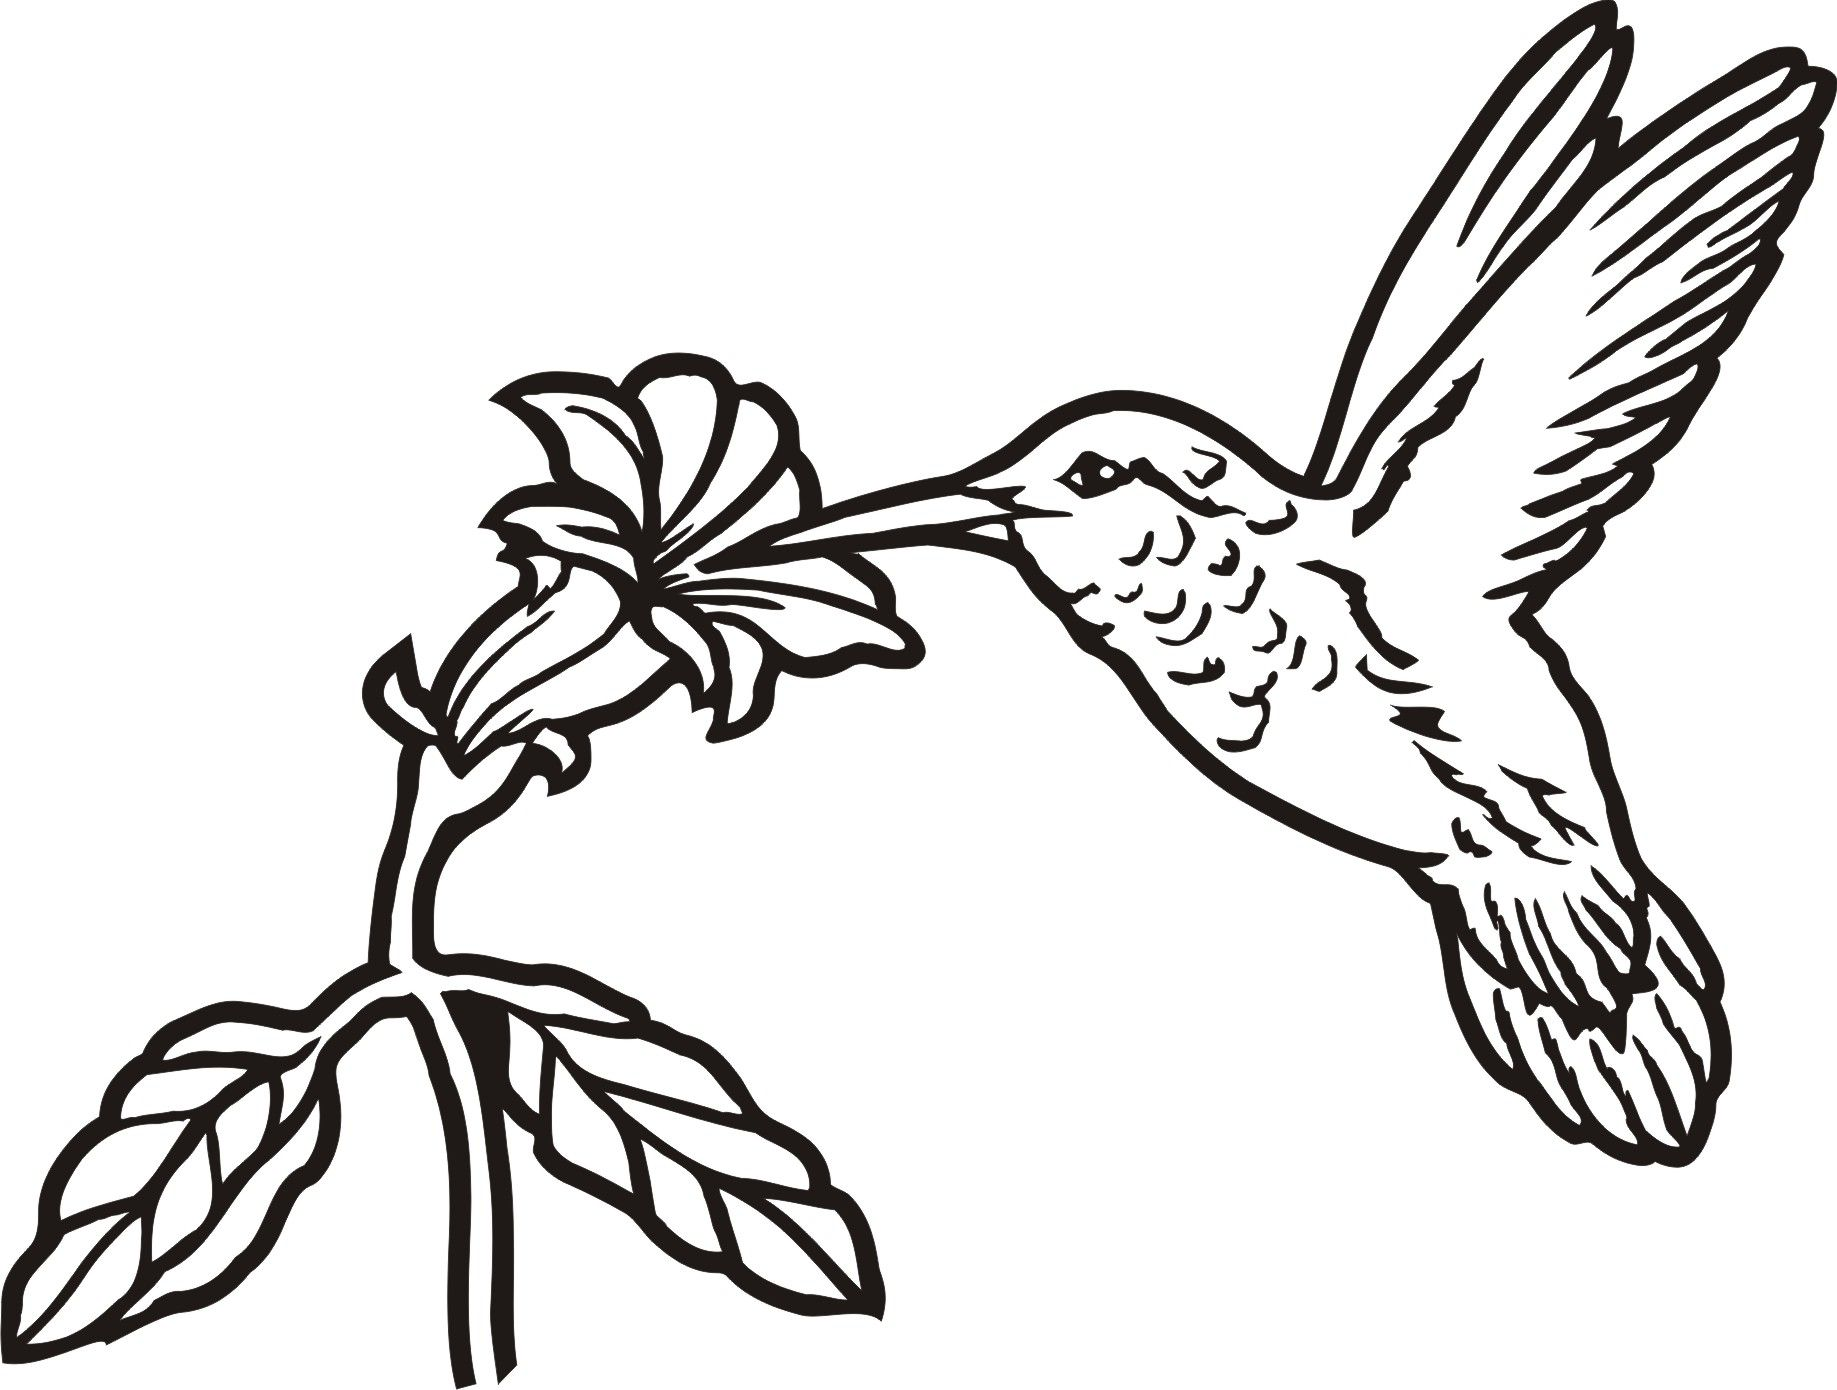 Hummingbird And Flower Drawing At Getdrawings